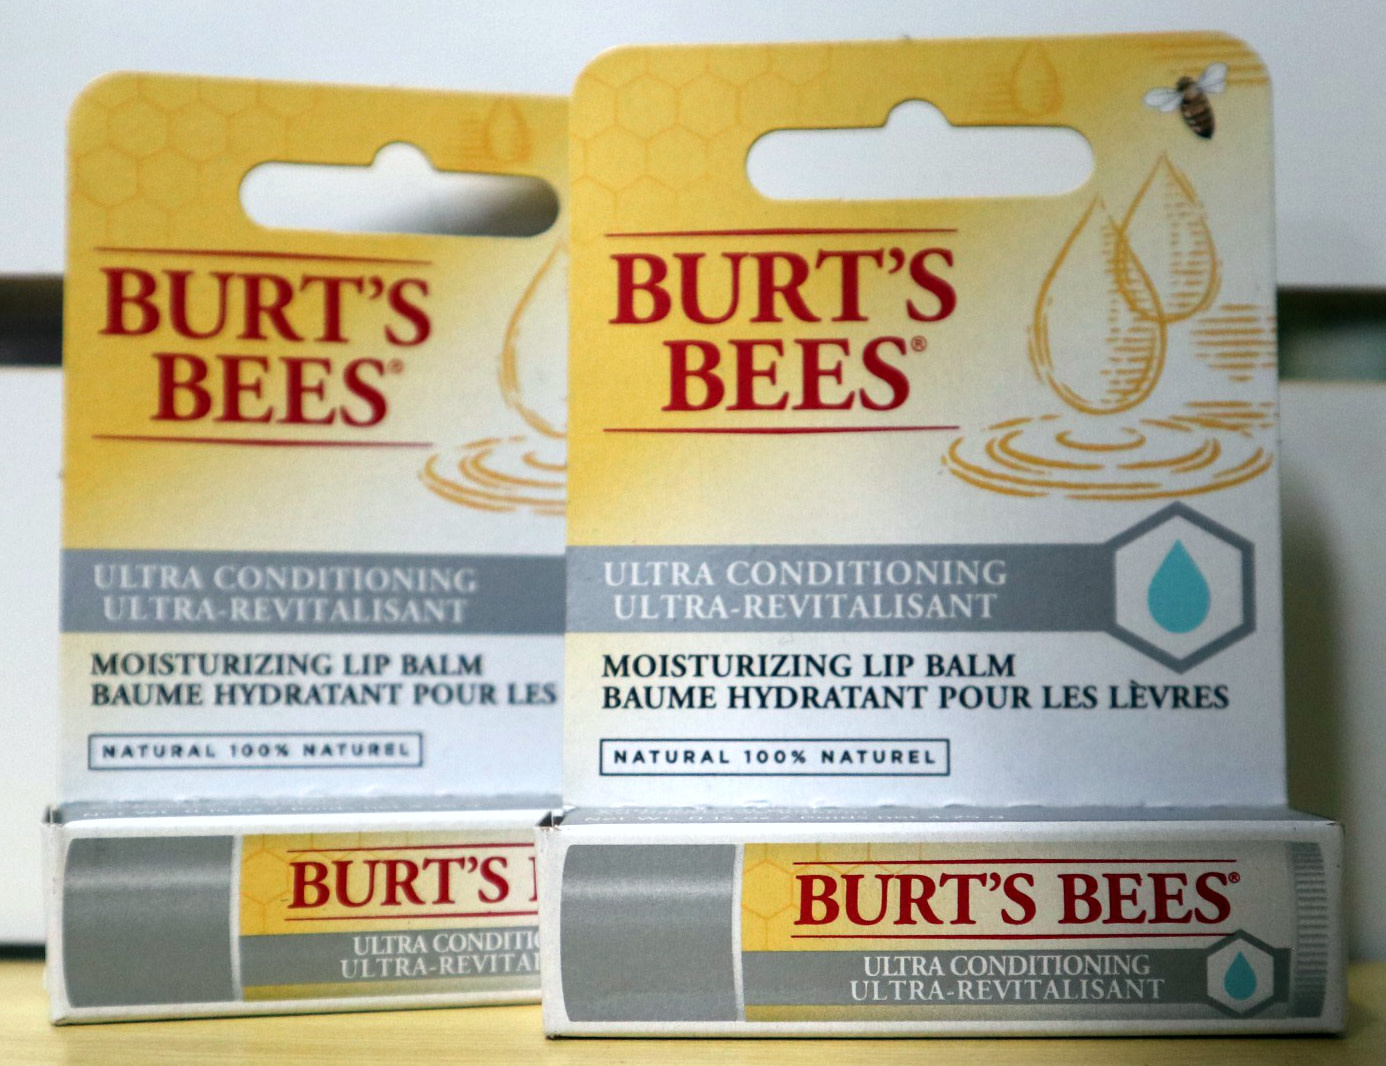 Burt's Bees Lip Balm - Ultra Conditioning